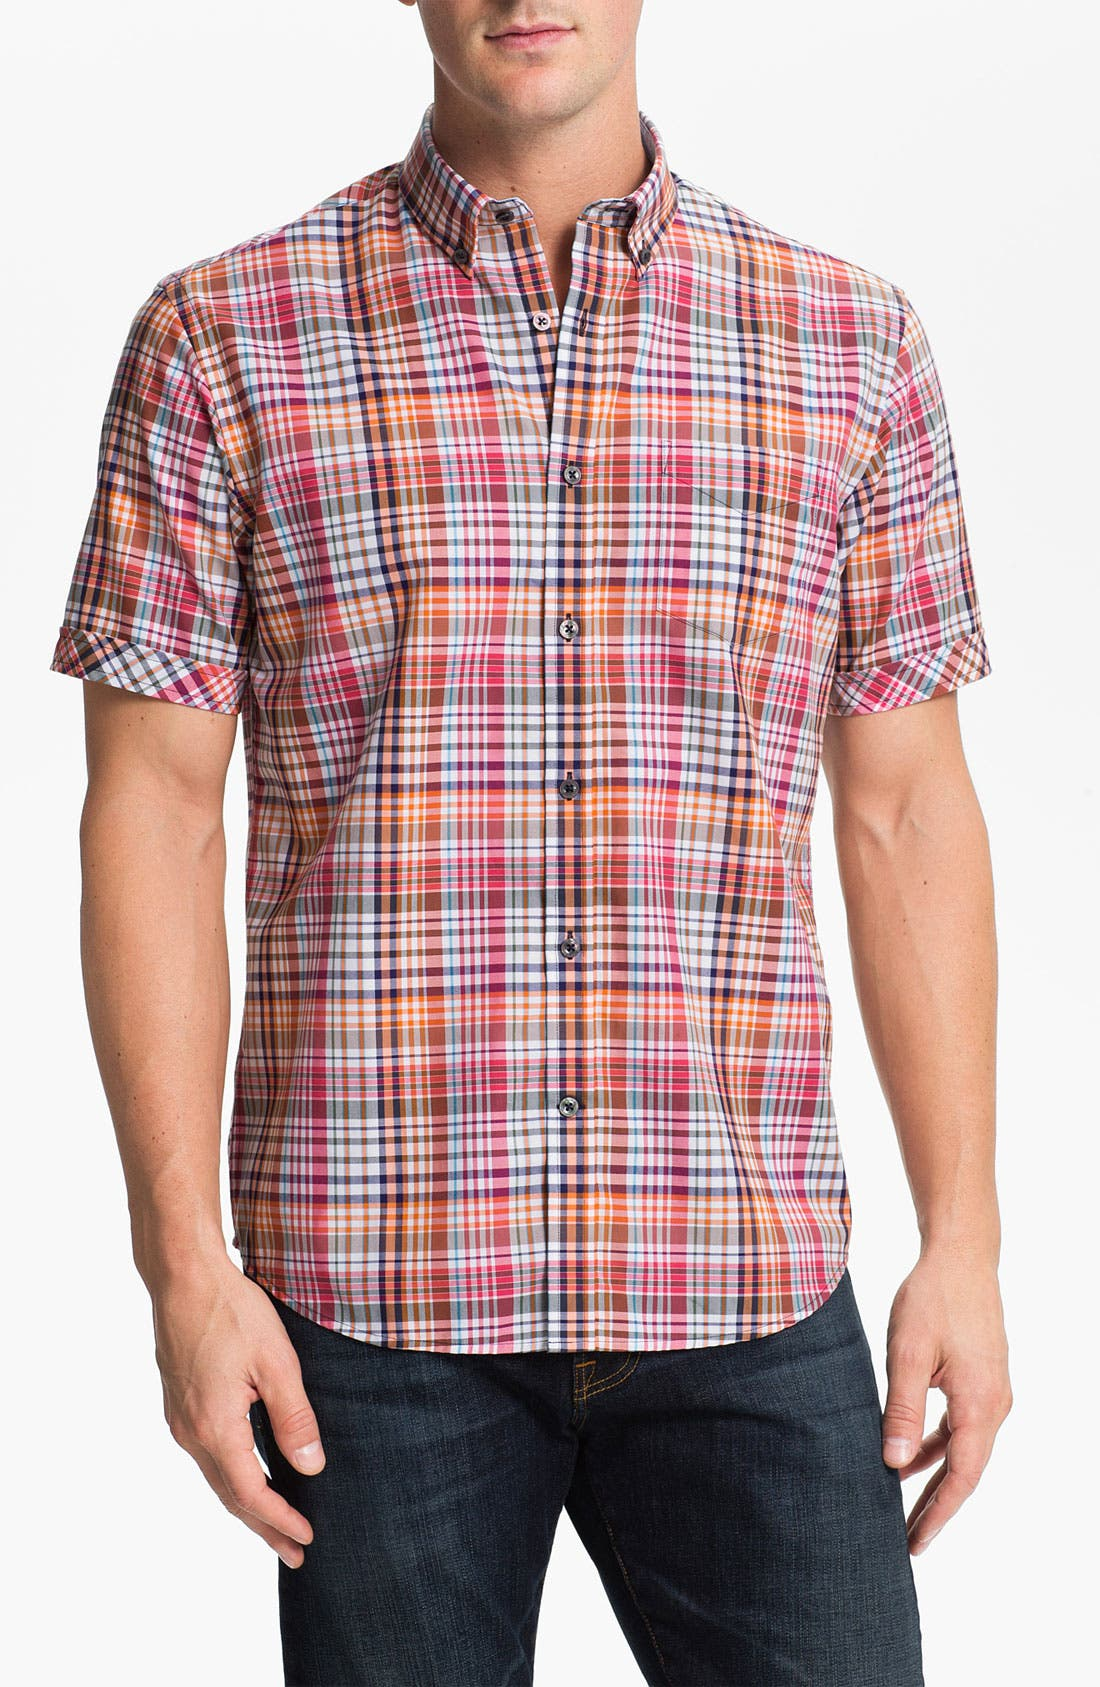 Alternate Image 1 Selected - James Campbell 'Jamie' Plaid Sport Shirt